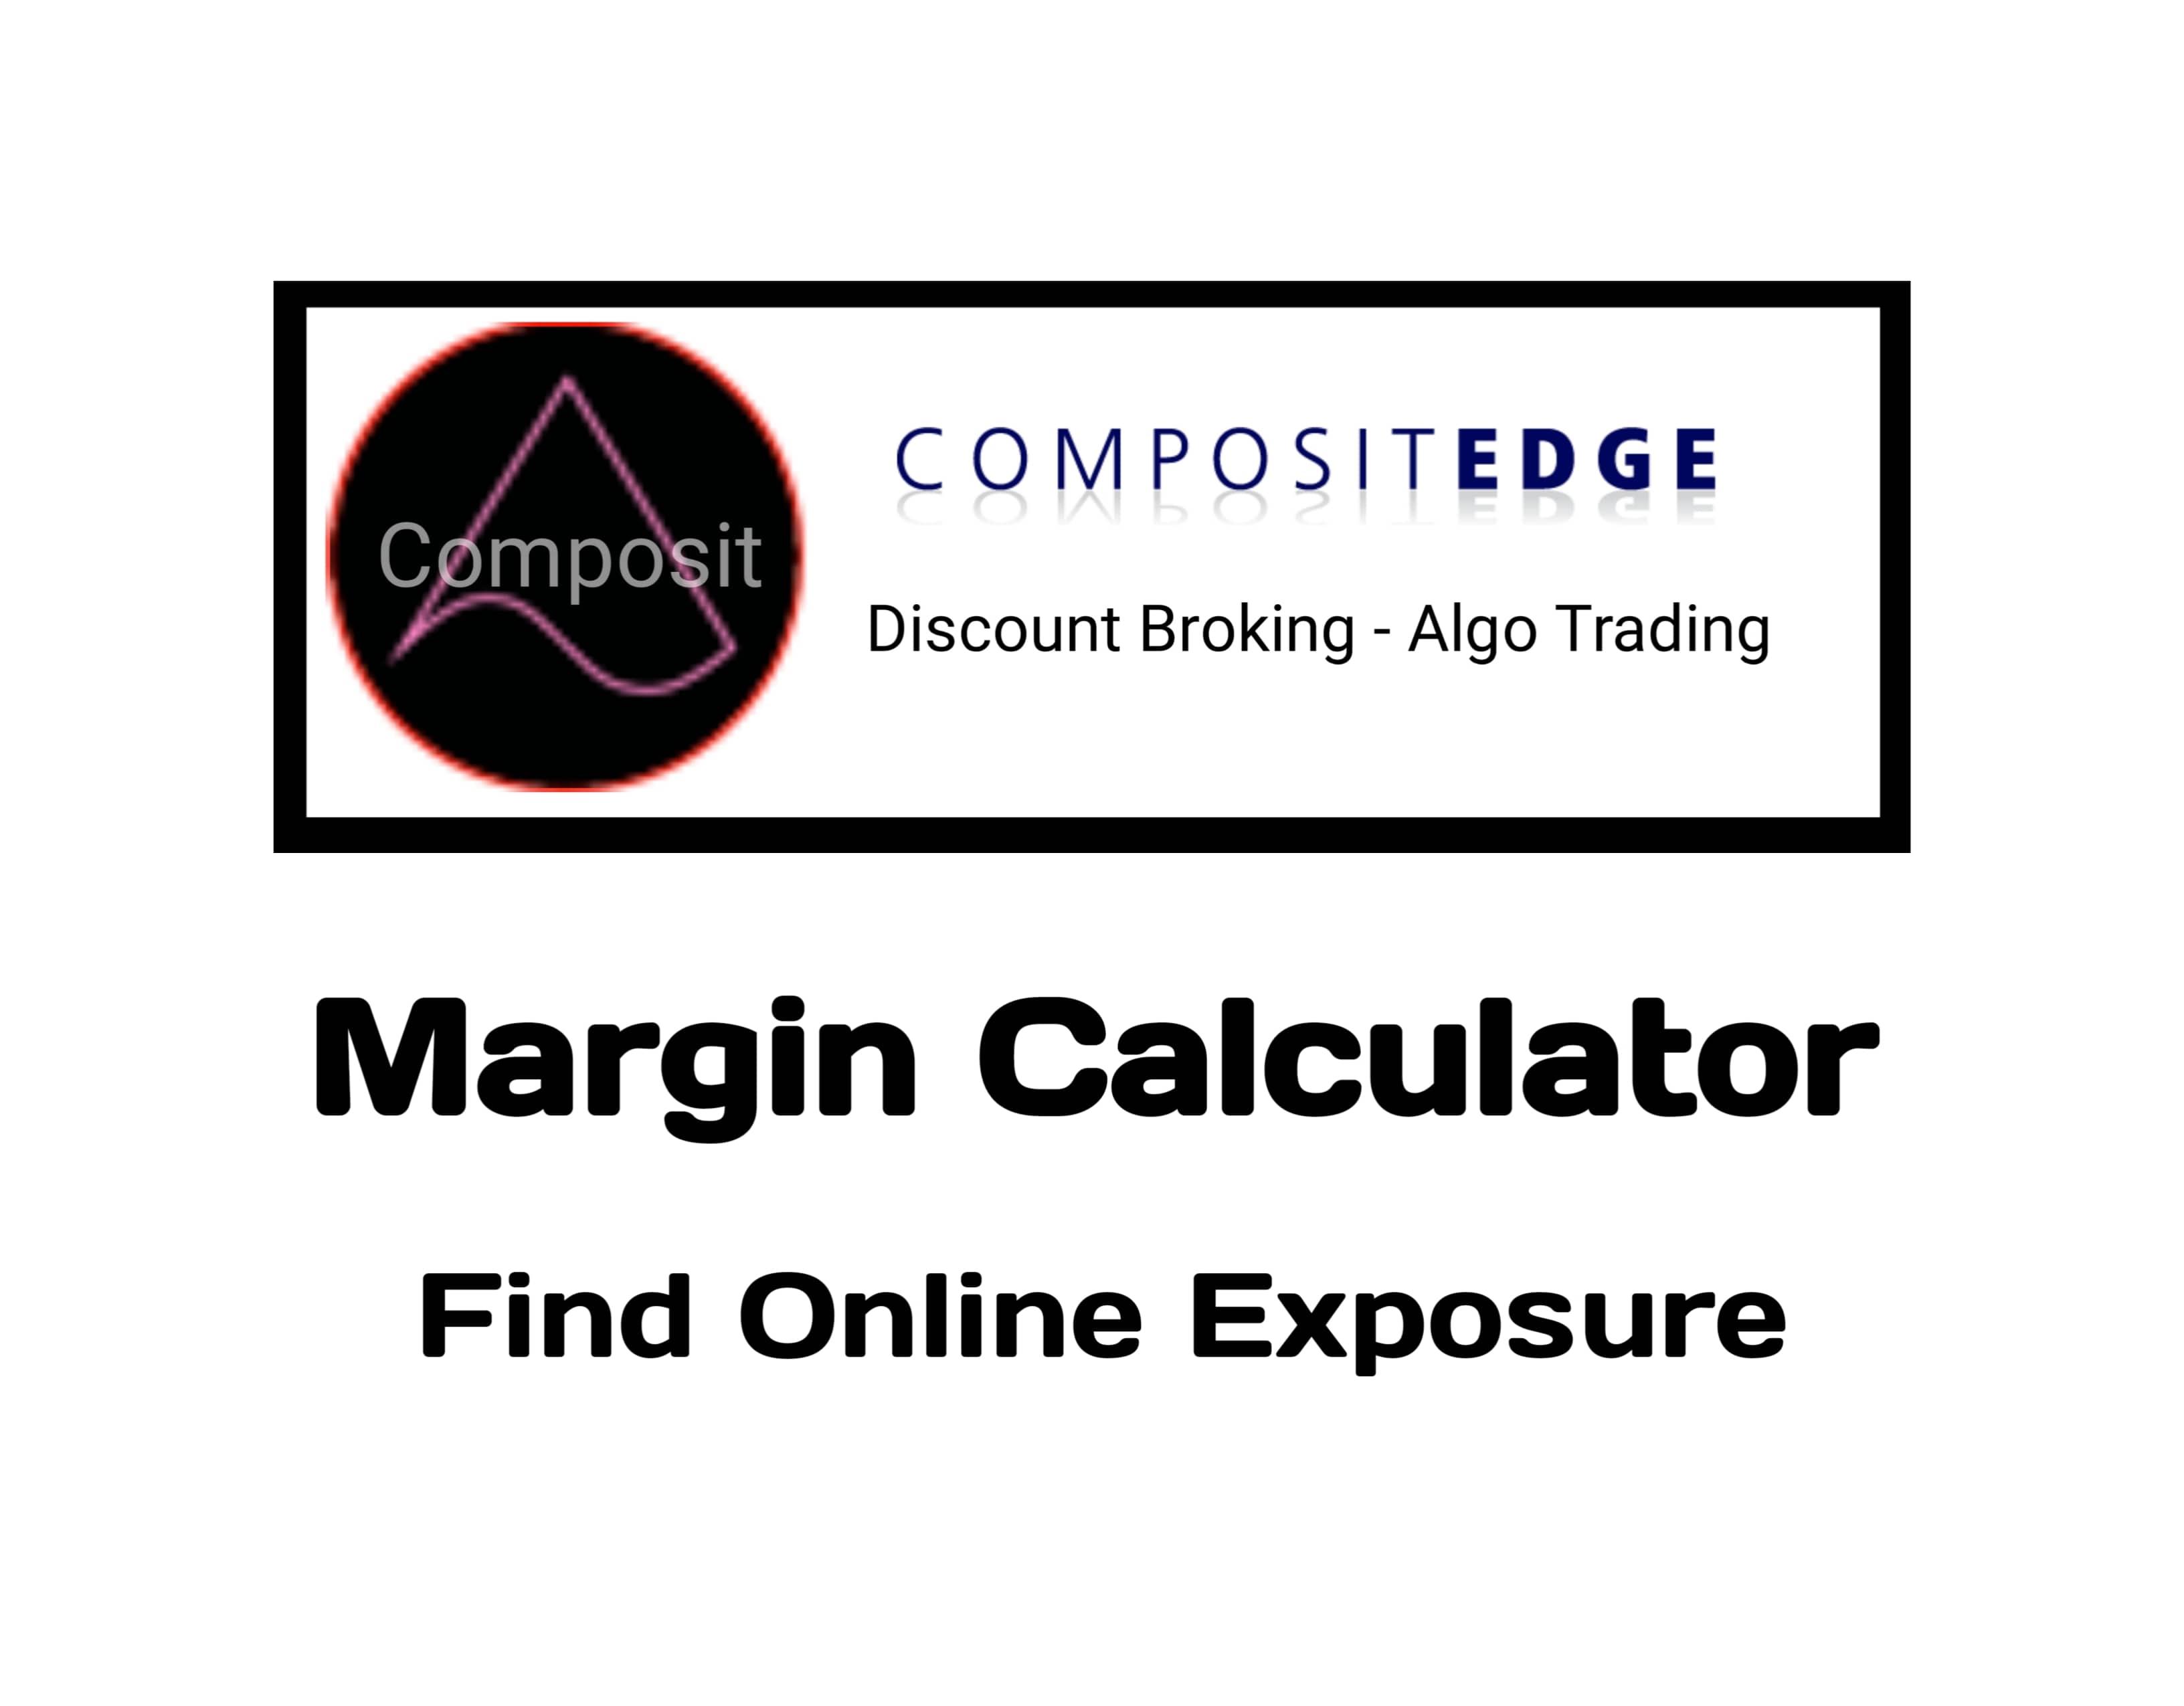 Composit Edge Margin Calculator